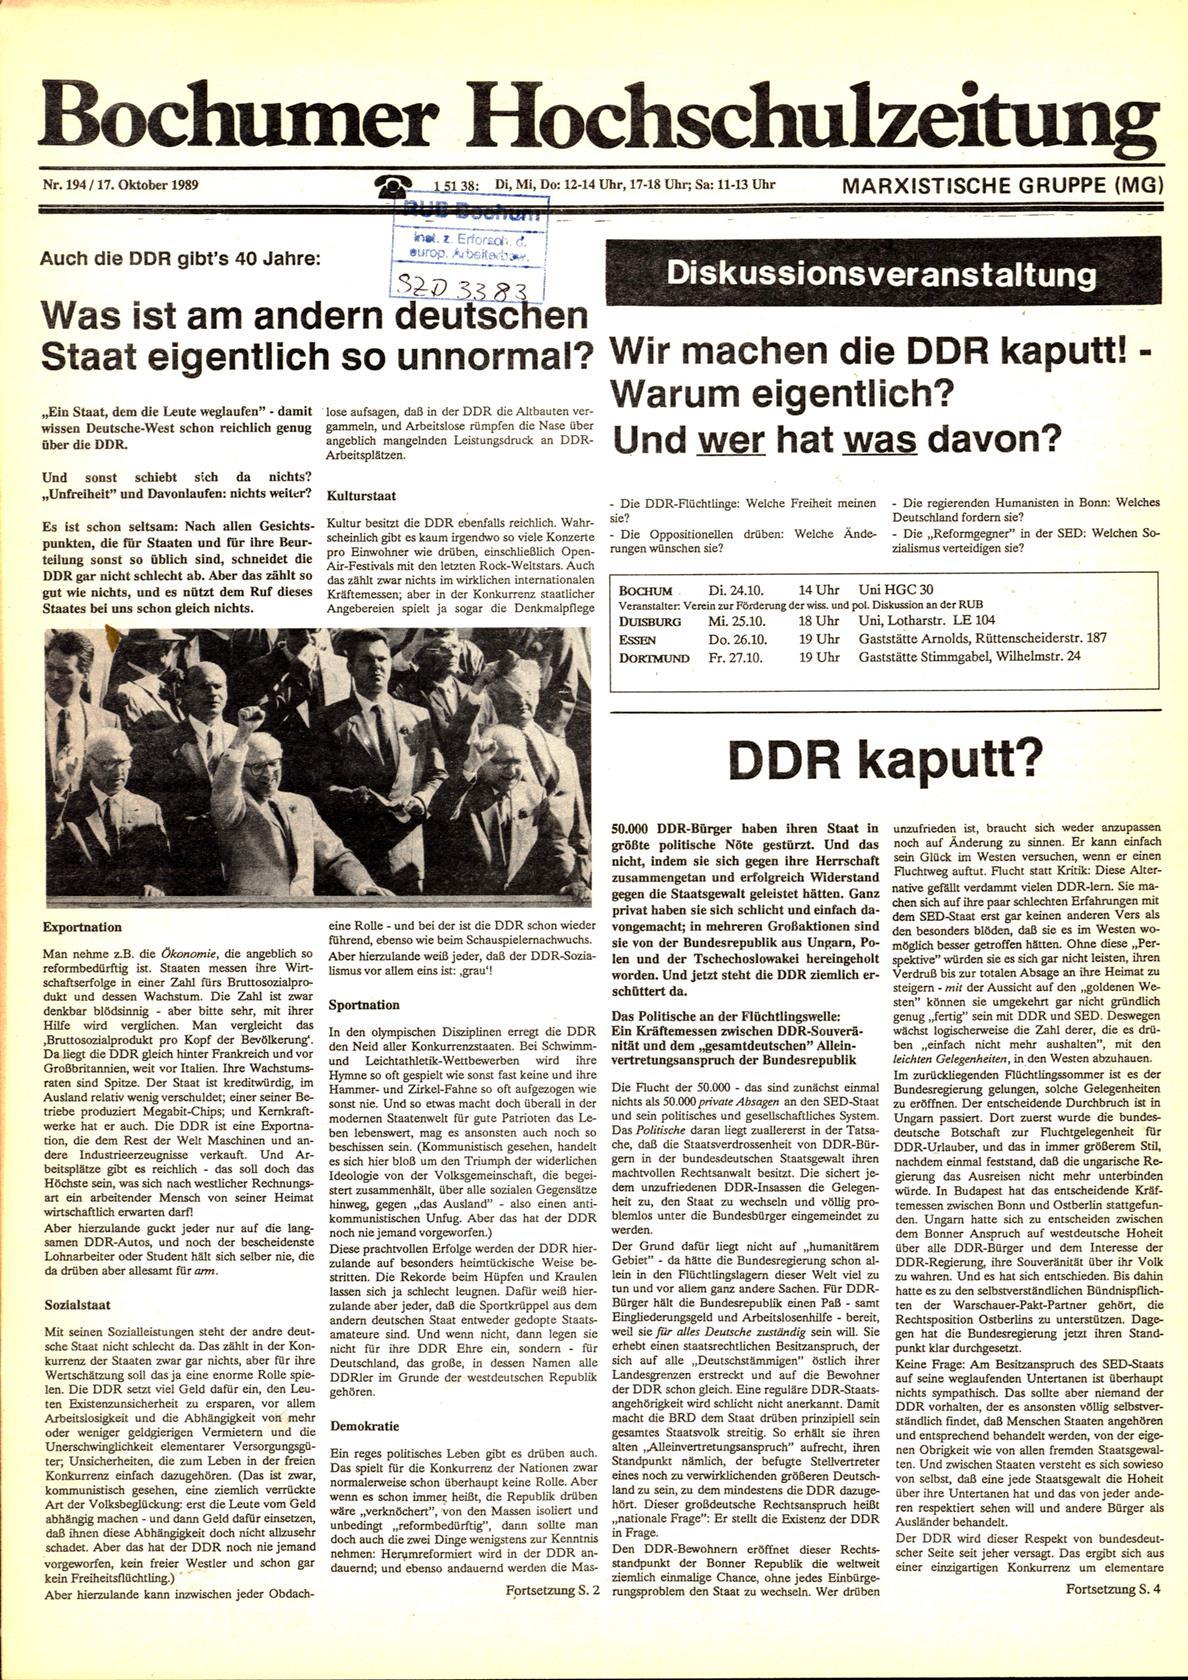 Bochum_BHZ_19891017_194_001